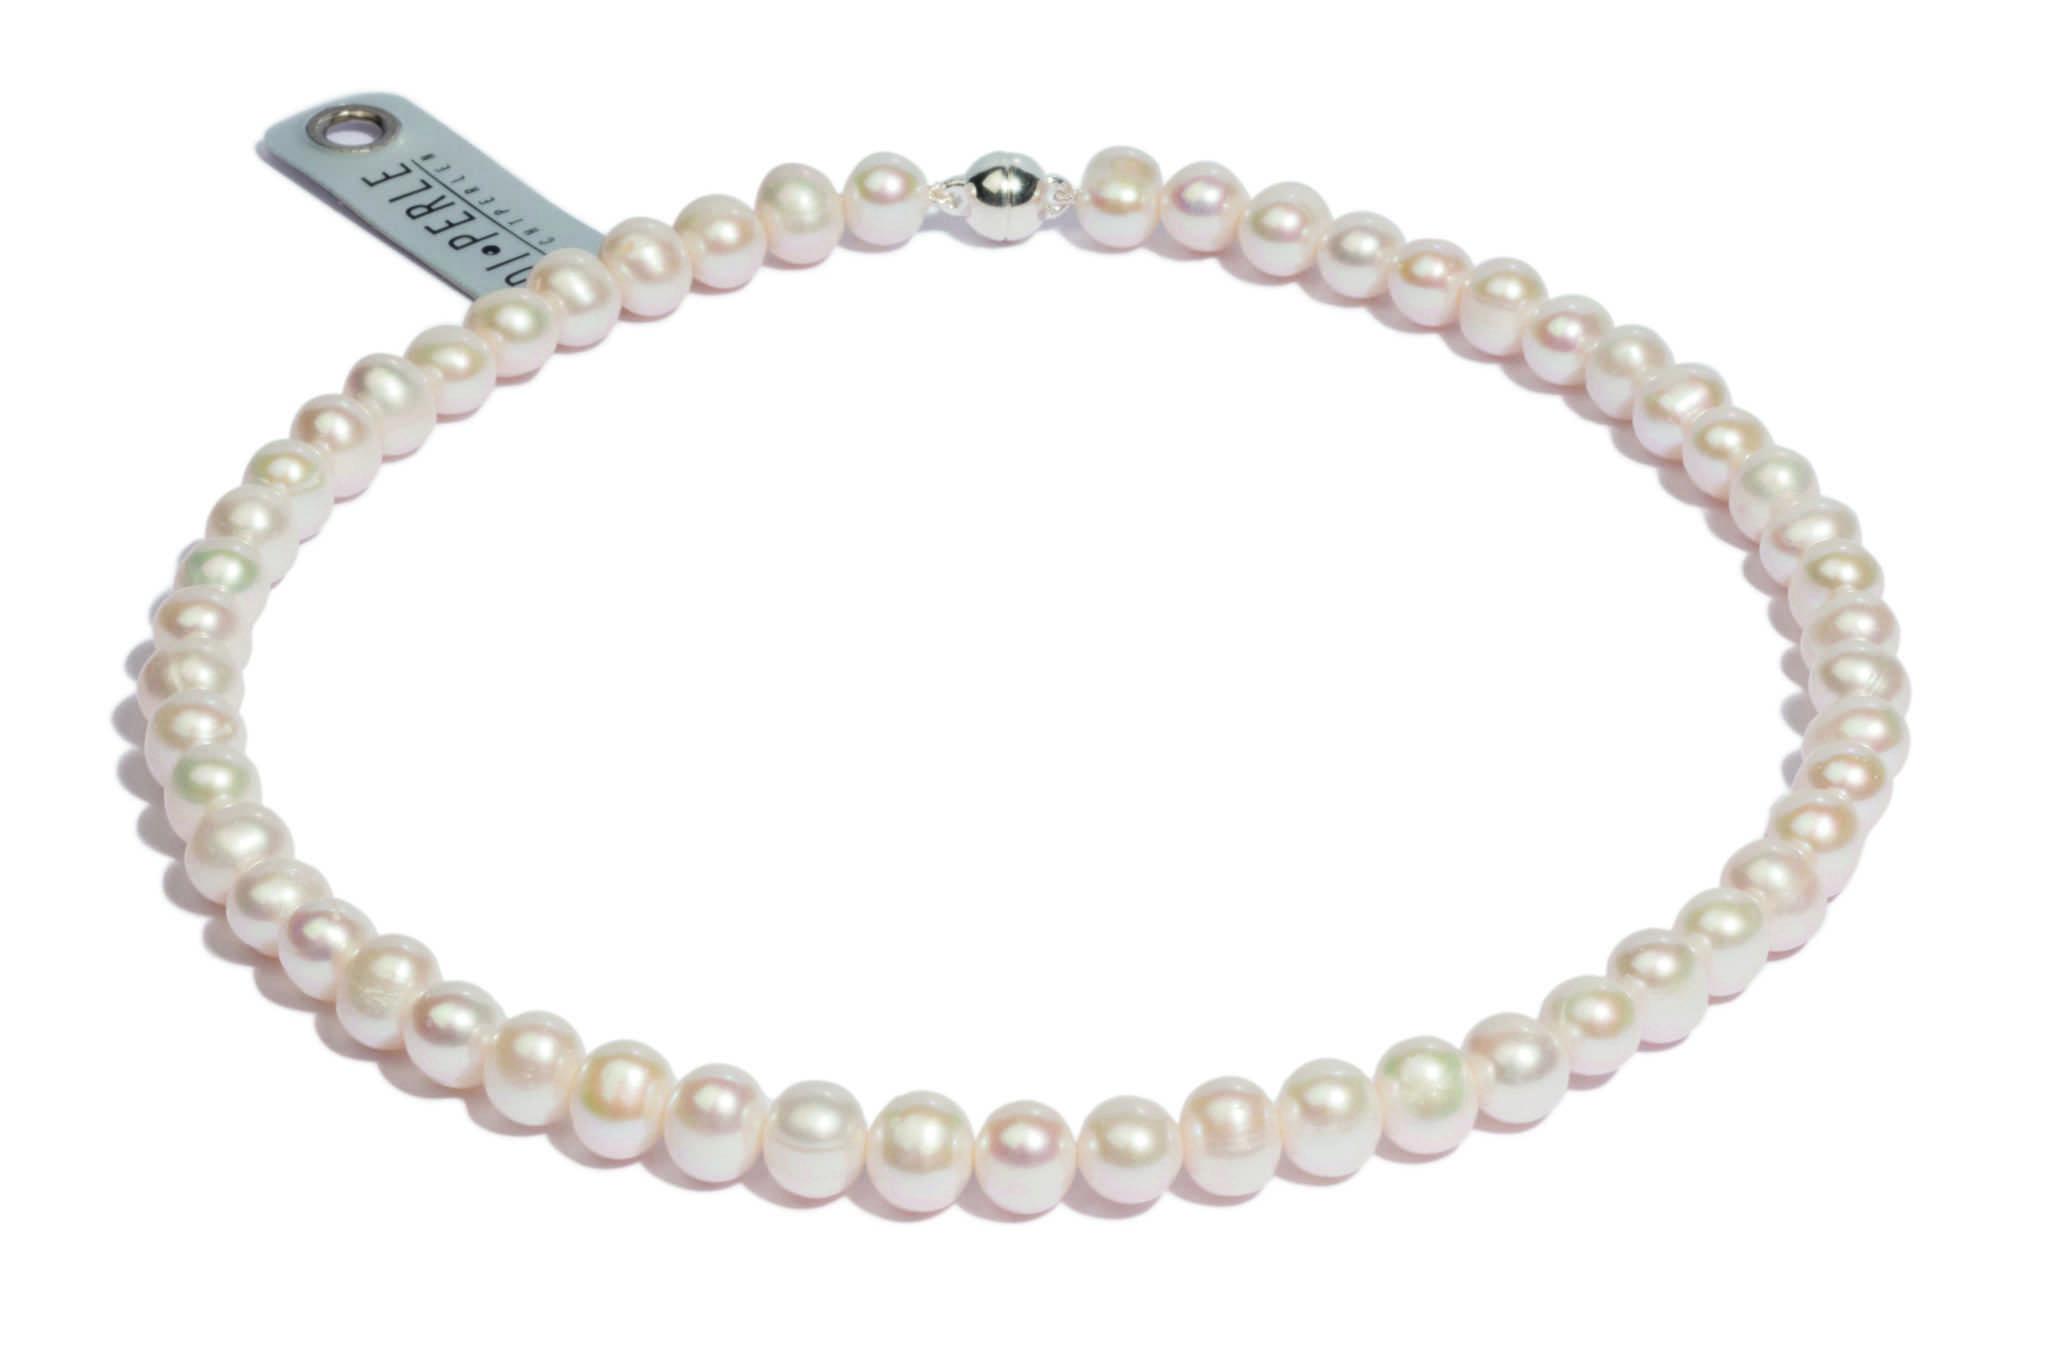 Klassisches Perlenarmband von DI PERLE